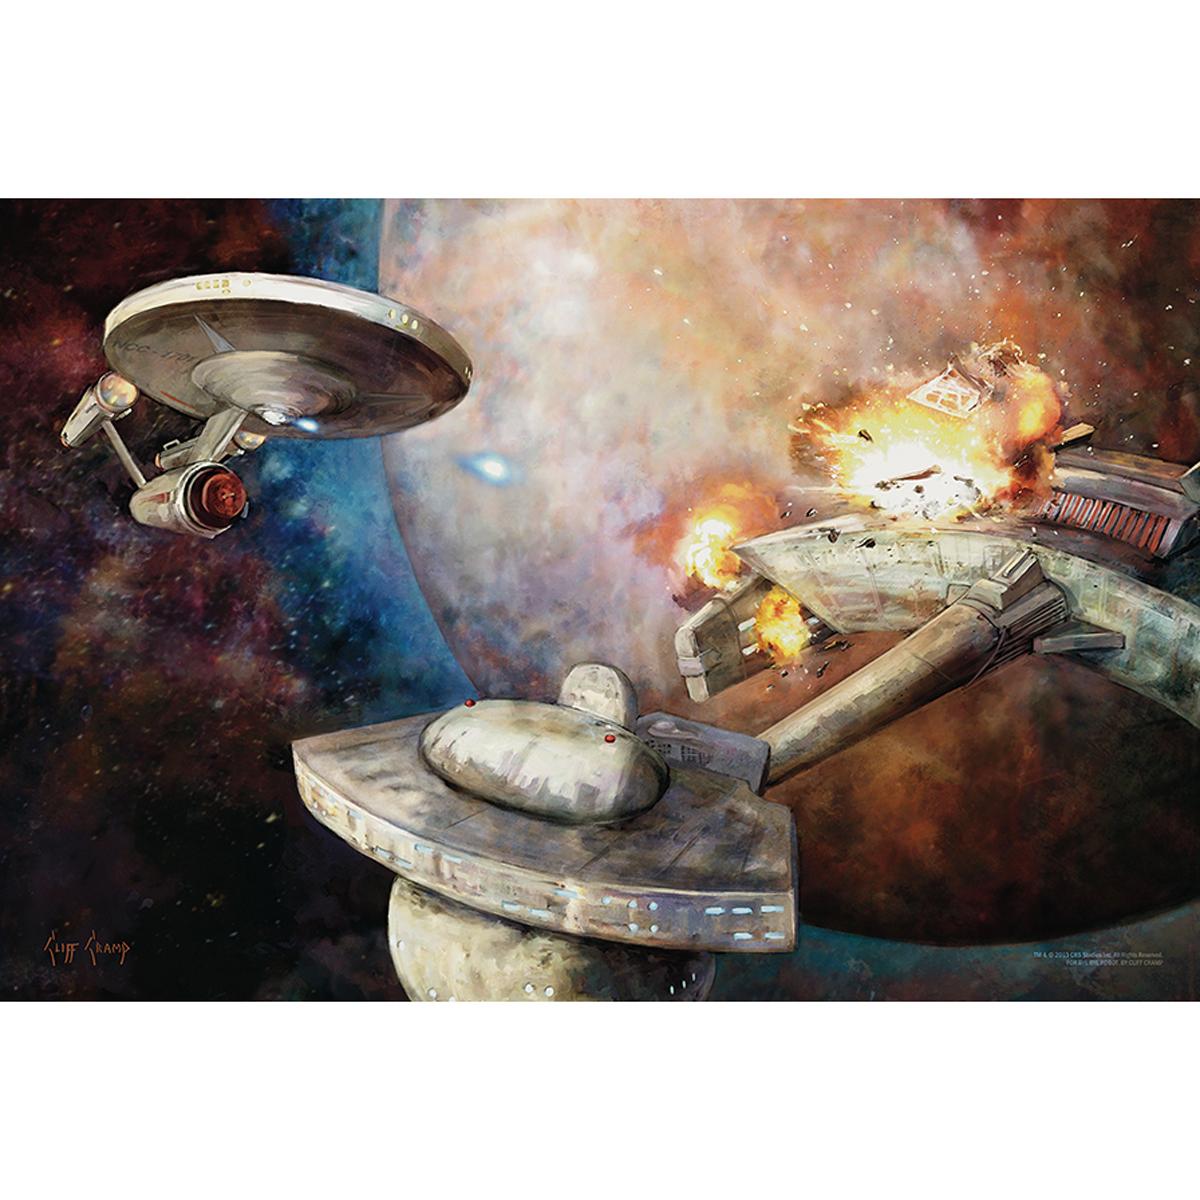 Star Trek The Next Generation A Good Day To Die Poster [16x24]